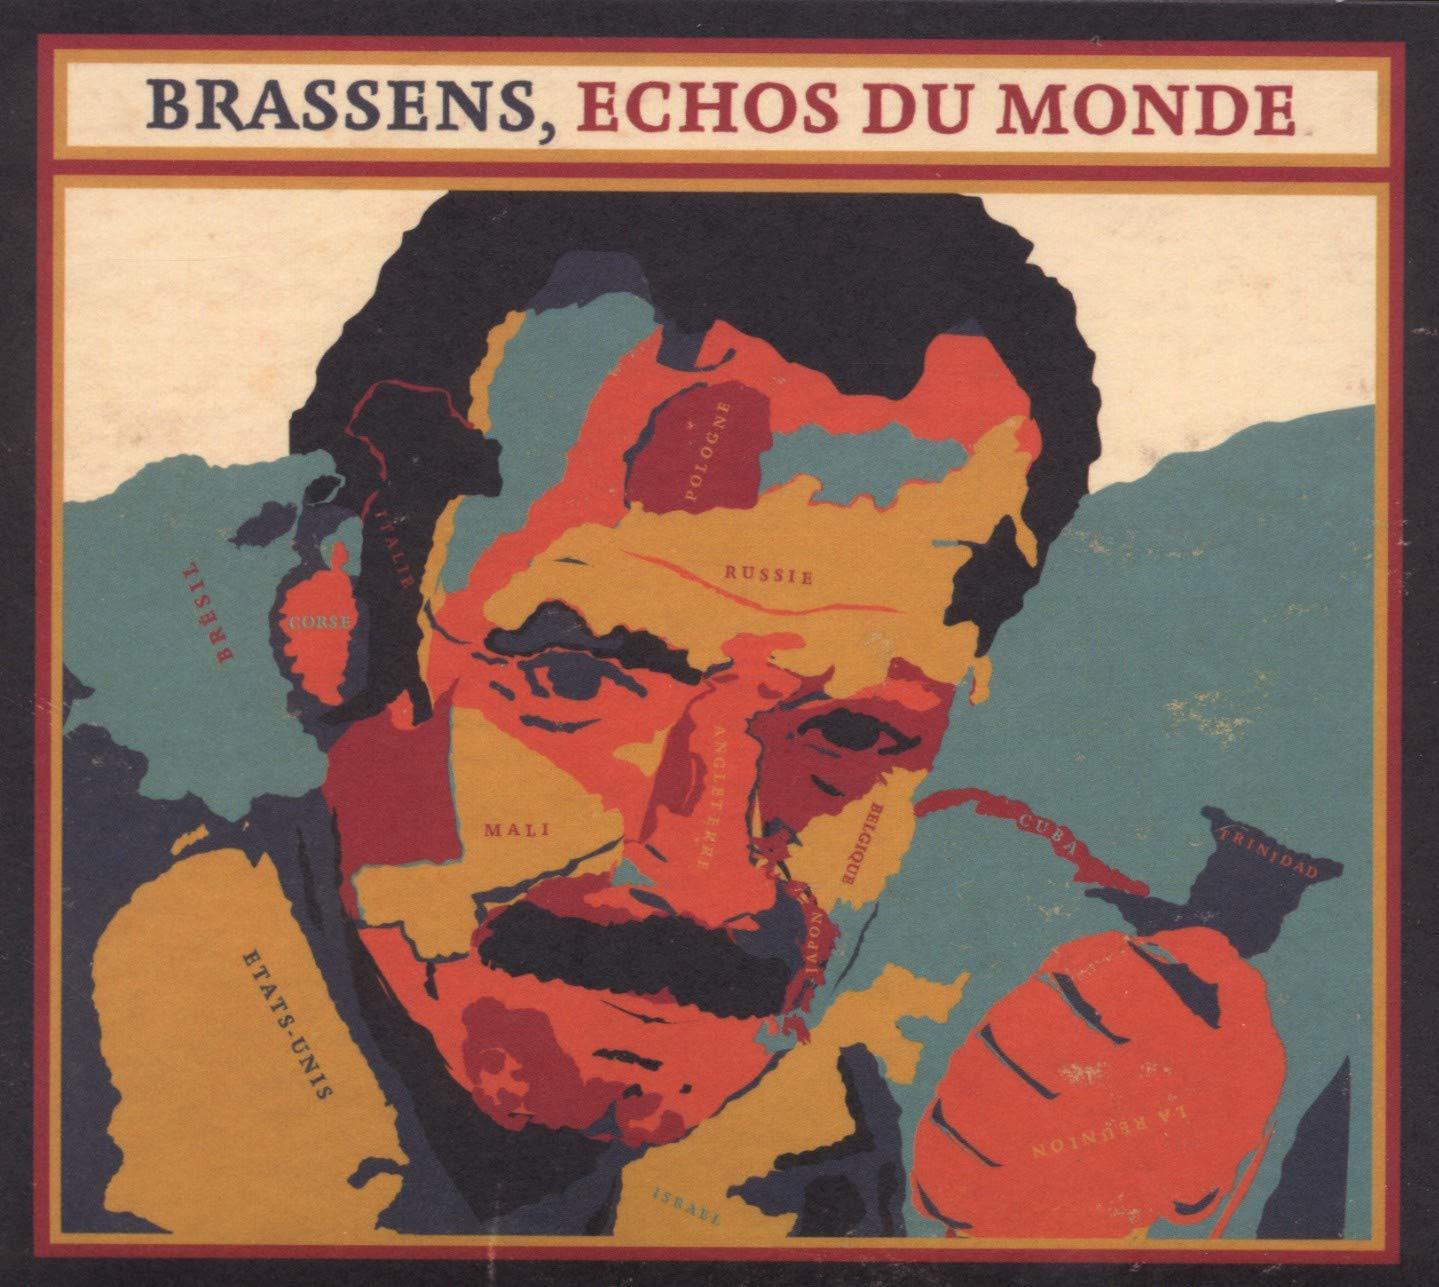 Brassens Chante encore 71-zaw10